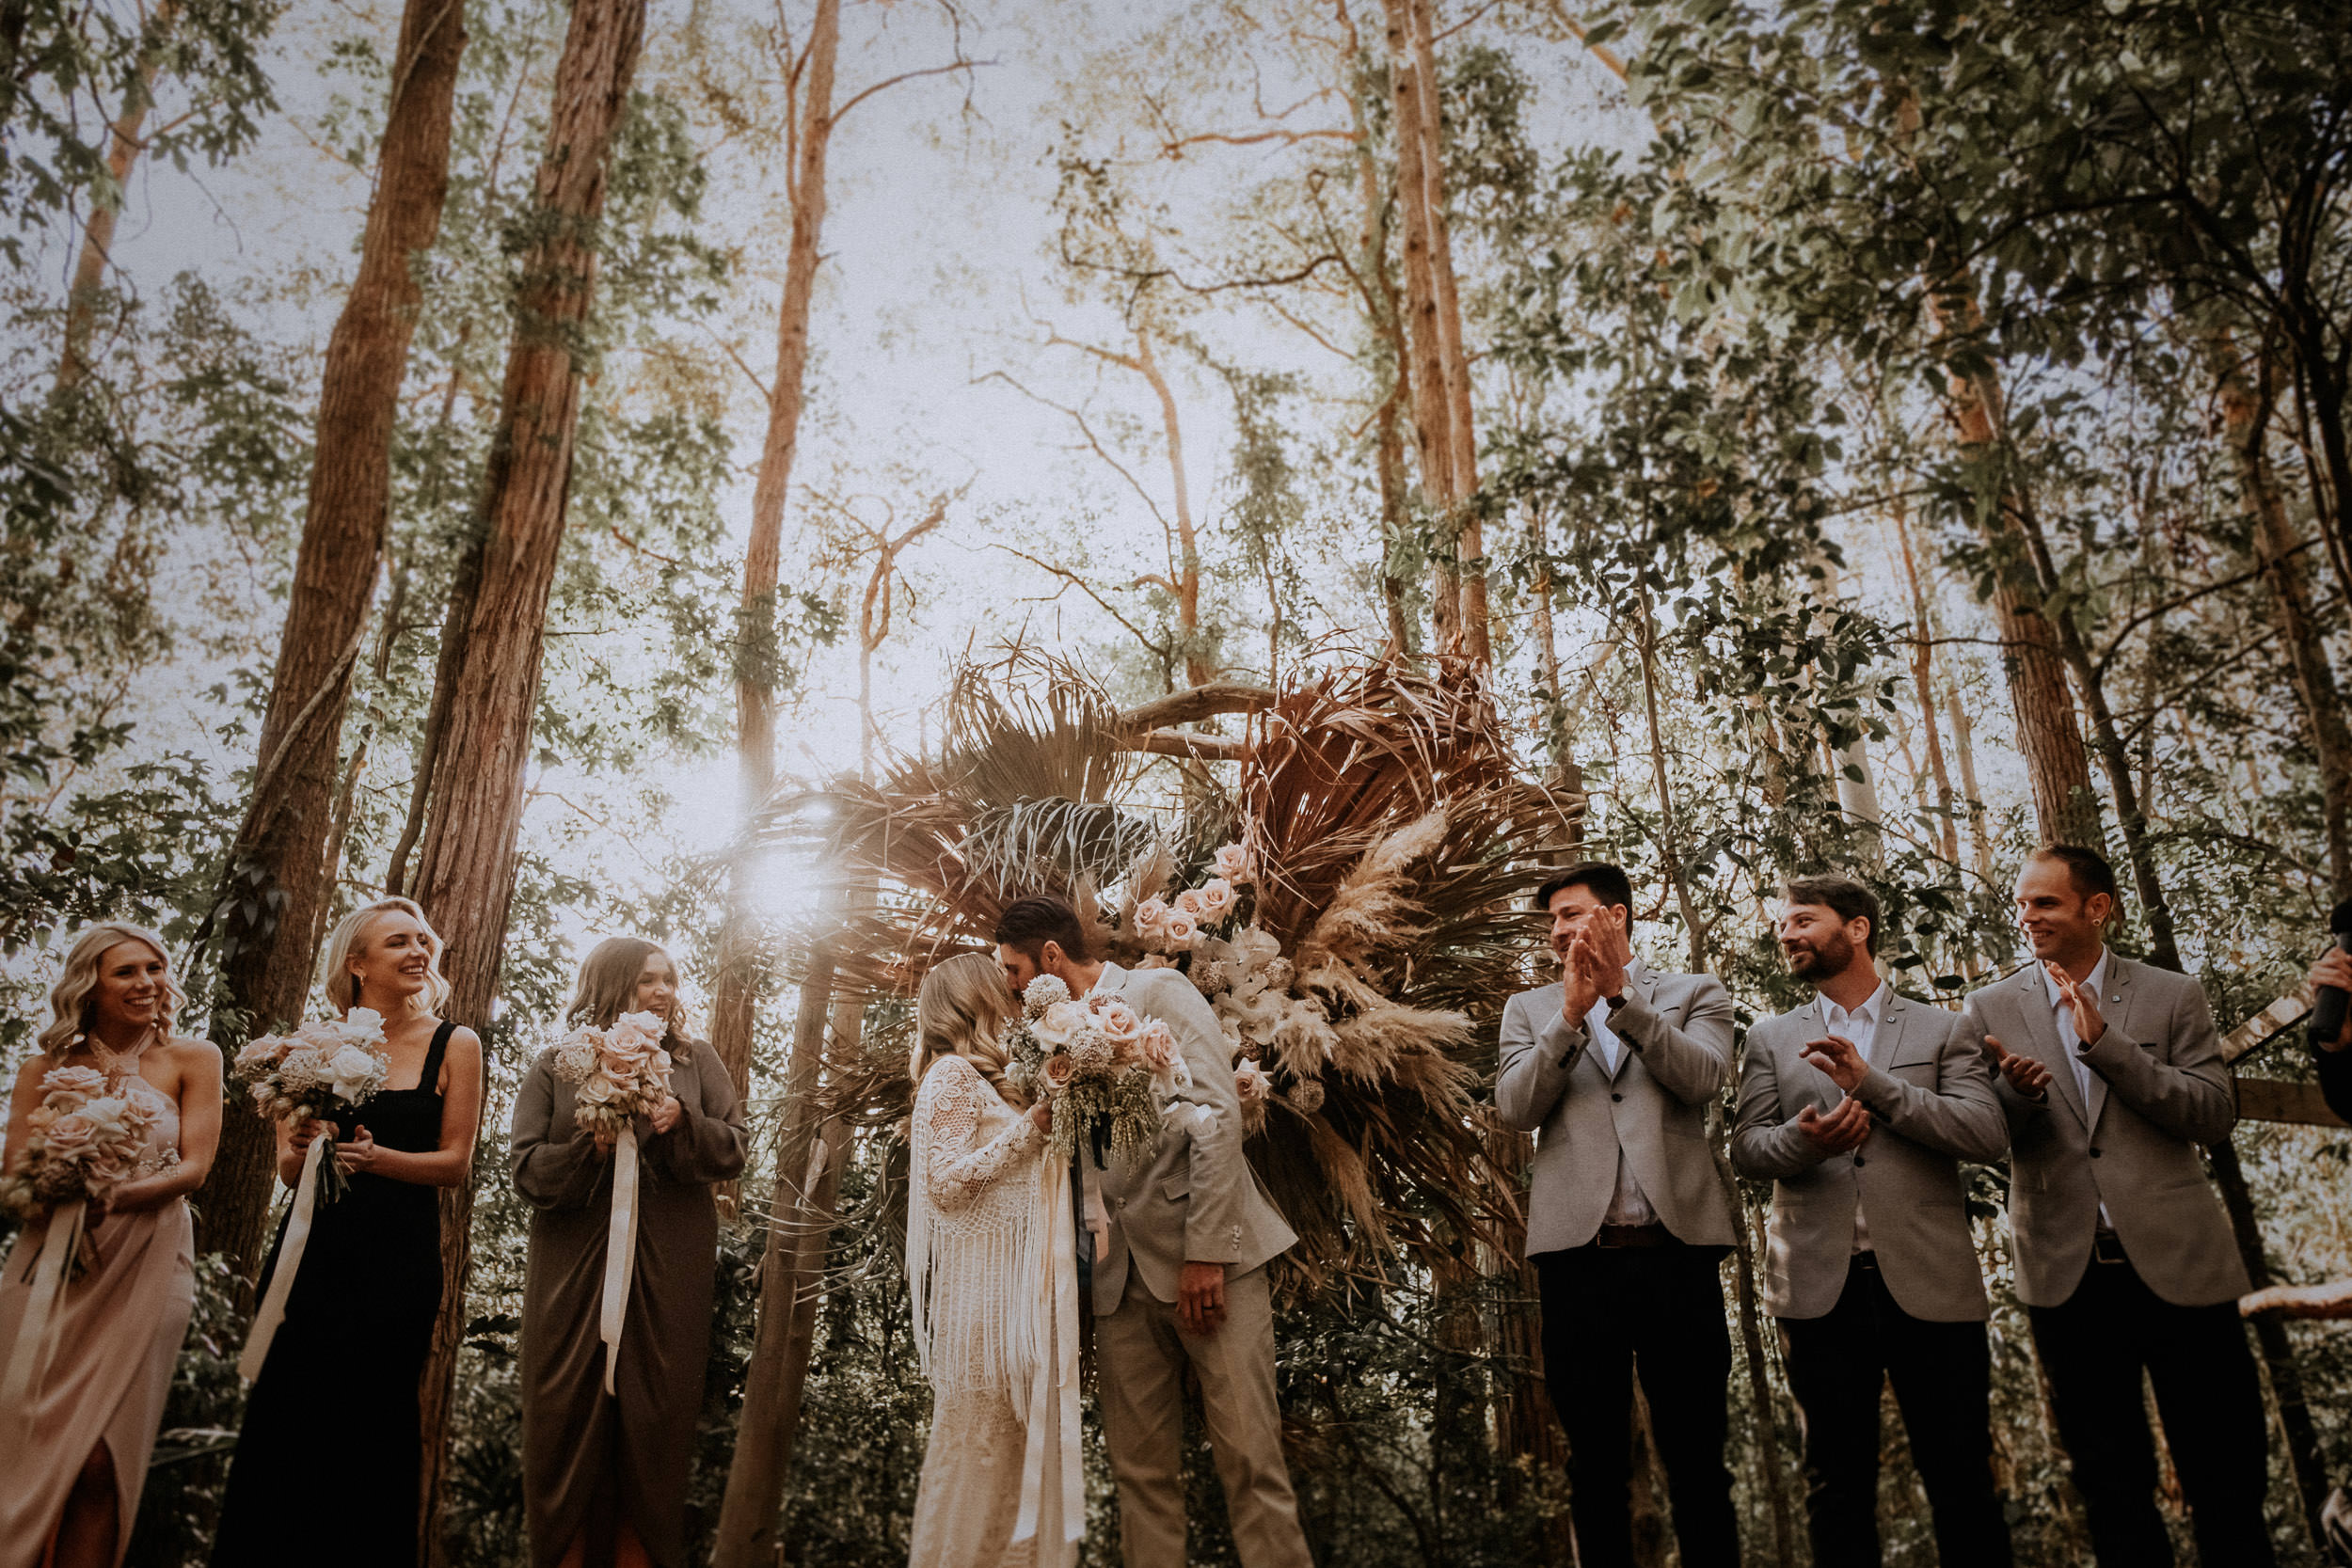 S&A Elopement - Kings & Thieves - Shred 'Til Dead - Central Coast Beach Forest Wedding - 262.jpg